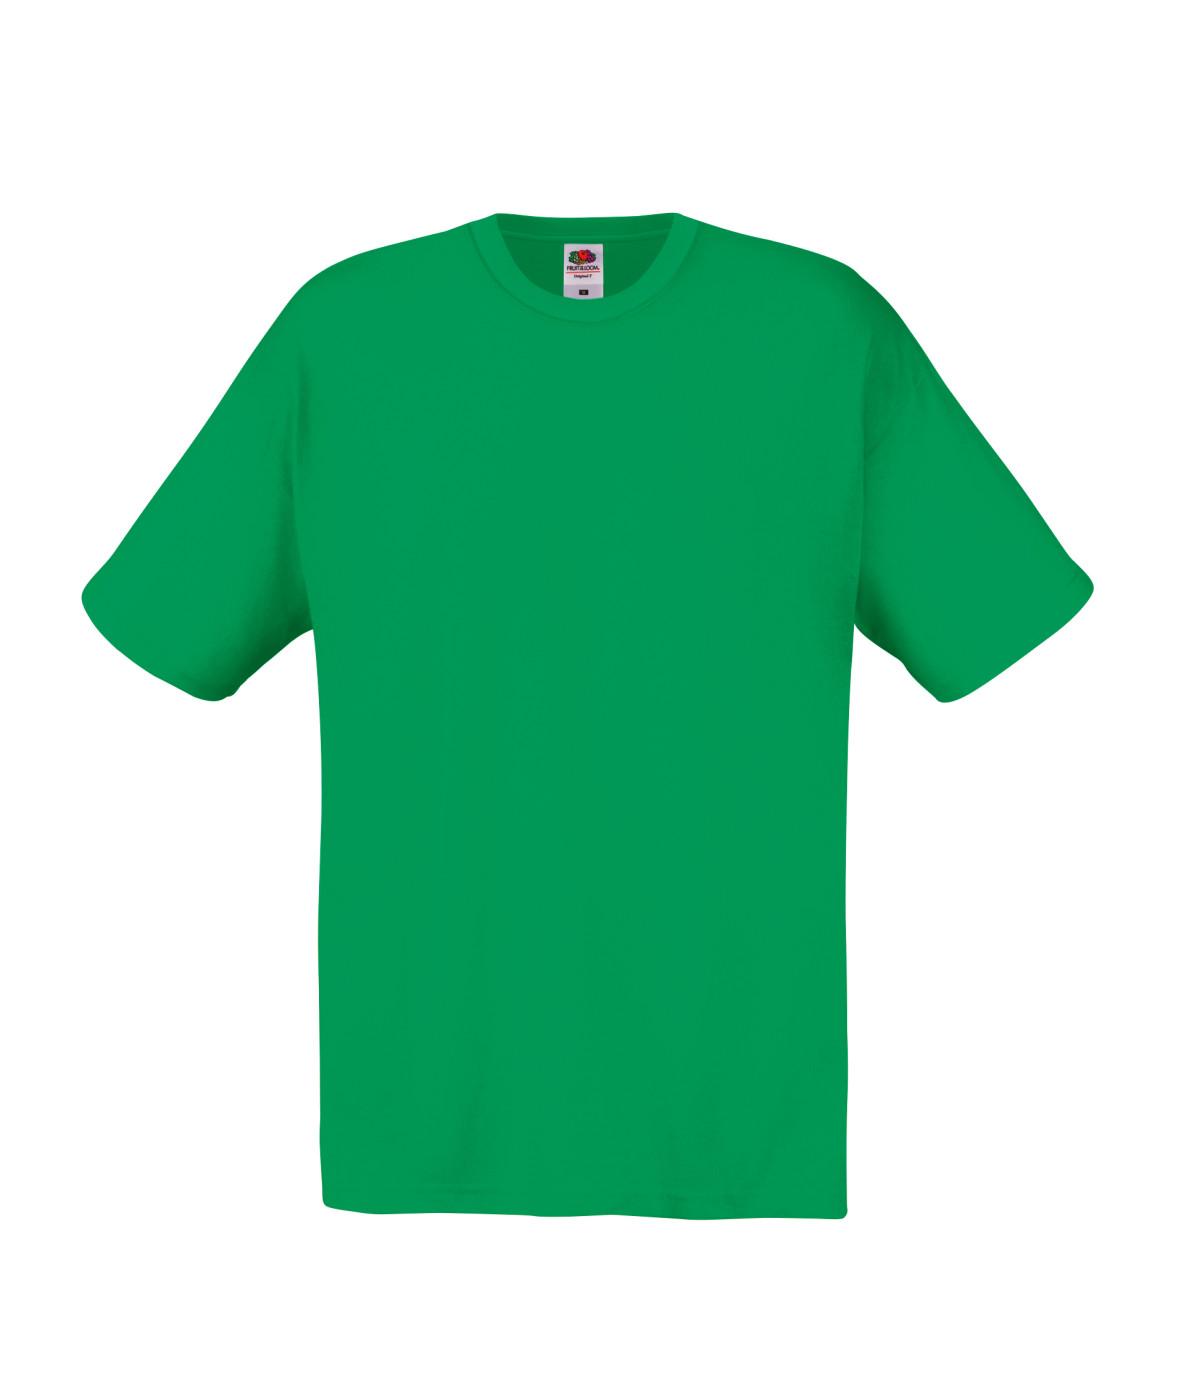 145gsm 100% Cotton Full Cut Original T Shirt Short Sleeve - STFA-kelly-green